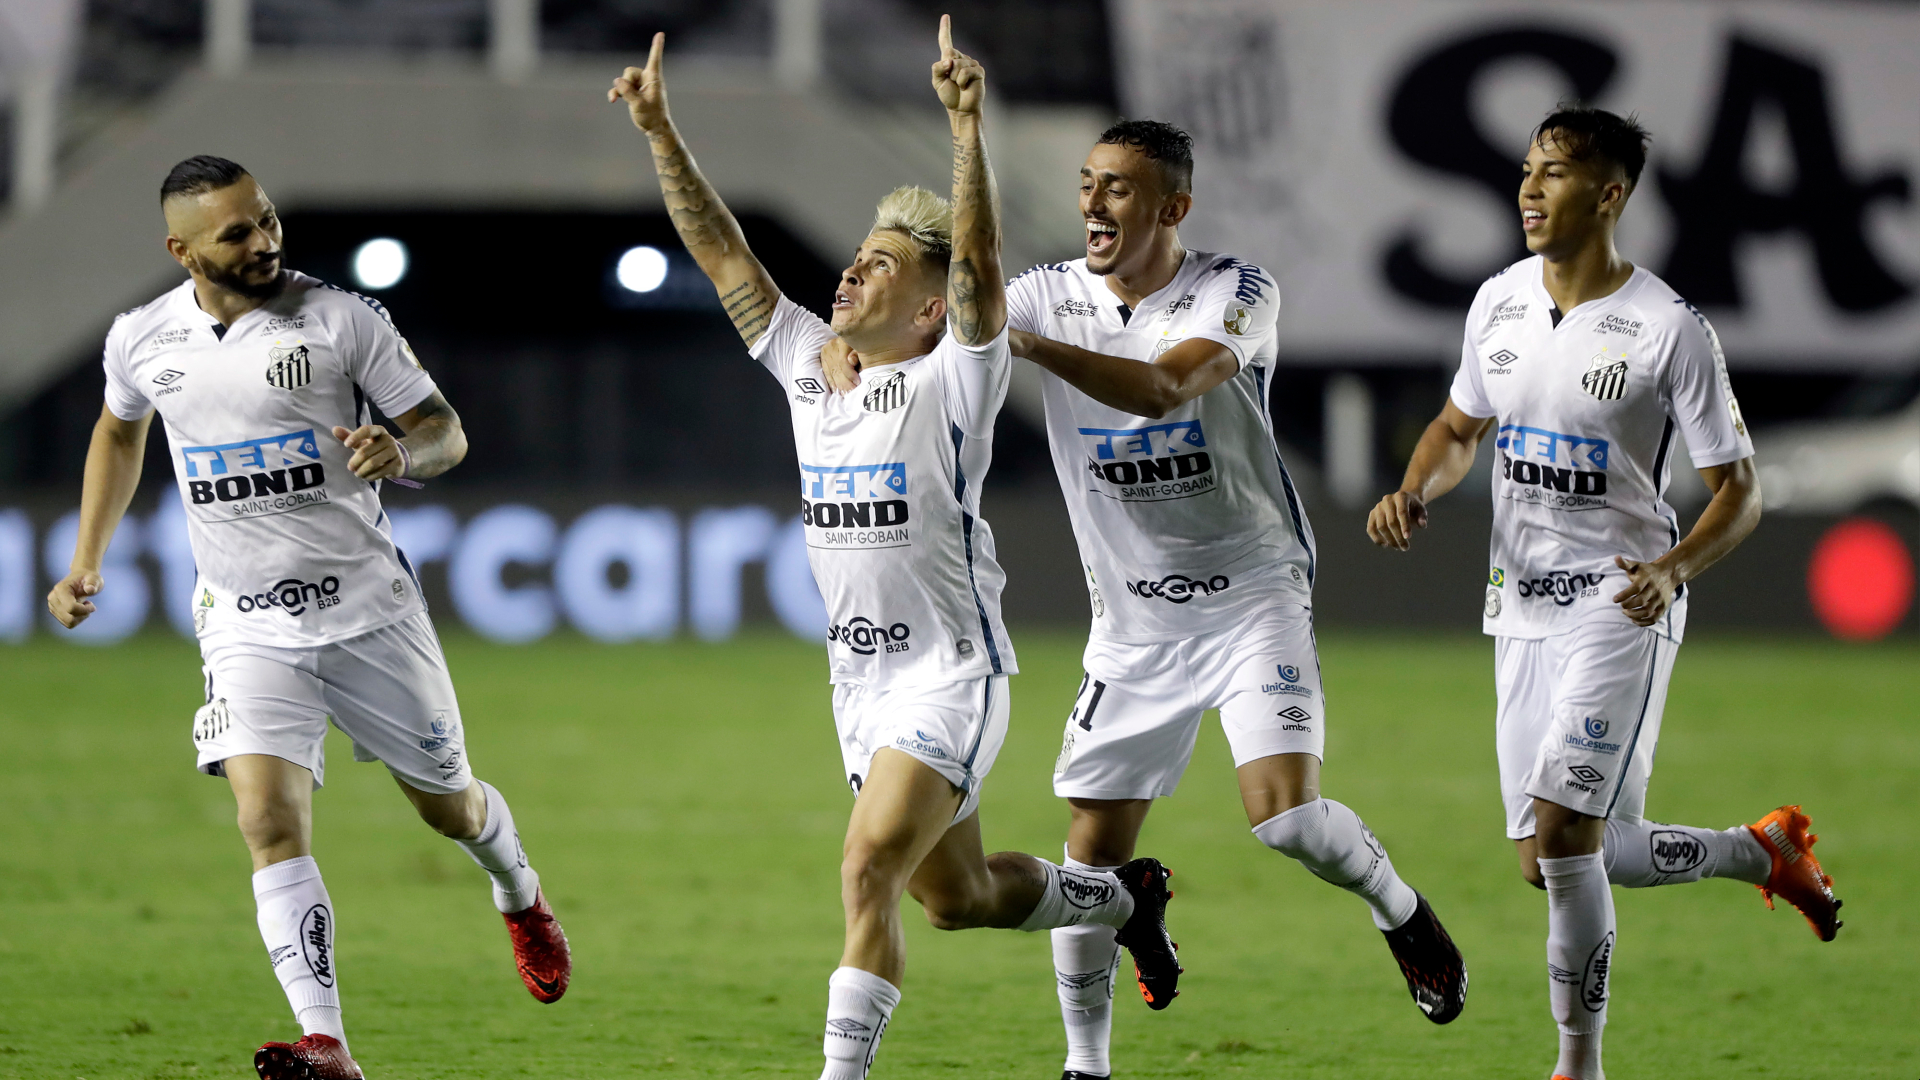 Santos 3-0 Boca Juniors (3-0 agg): Copa Libertadores final to be all-Brazilian affair